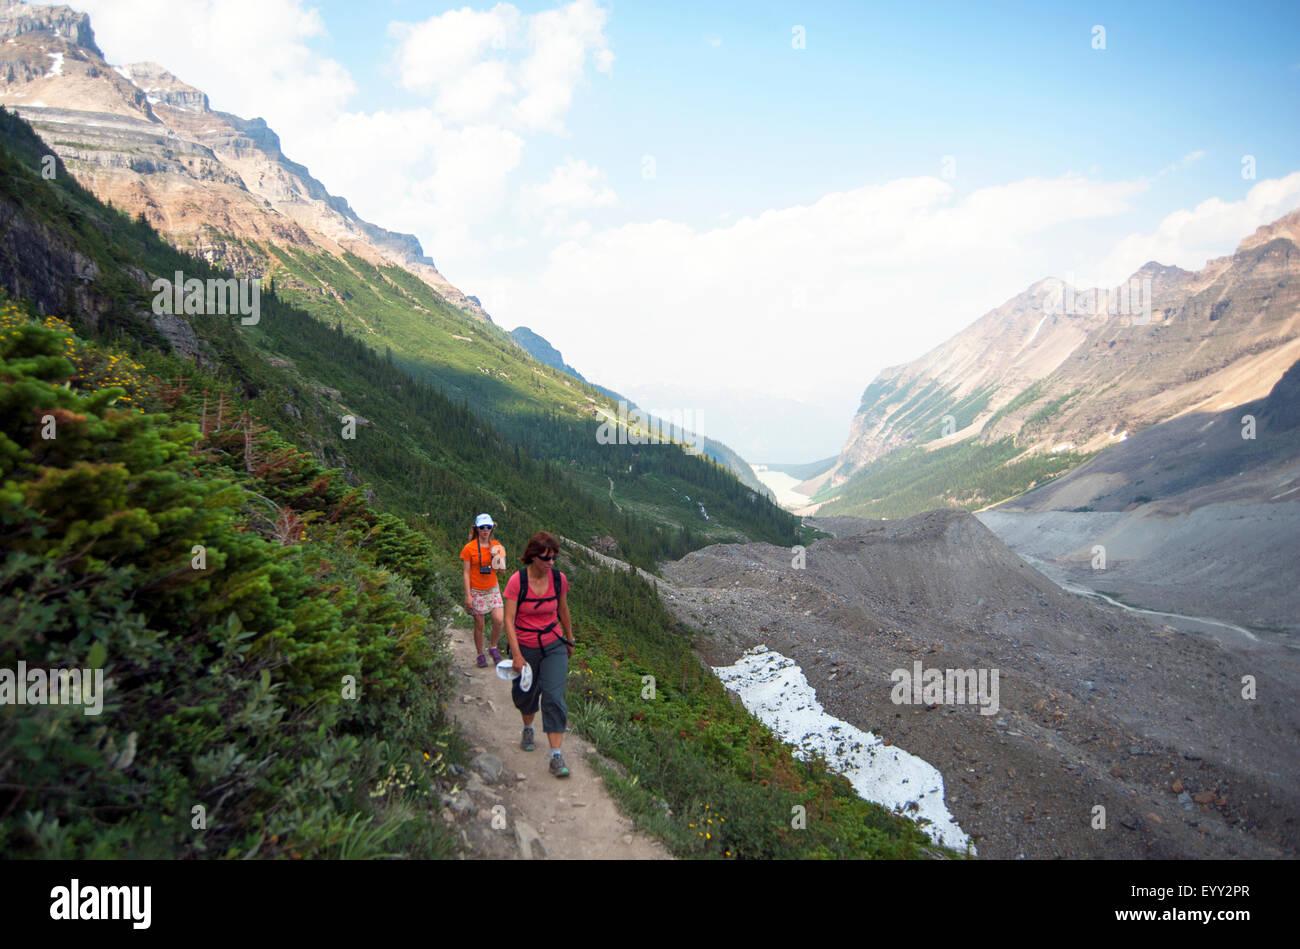 Madre e hija caucásica senderismo en seis glaciares Trail, Banff, Alberta, Canadá Imagen De Stock